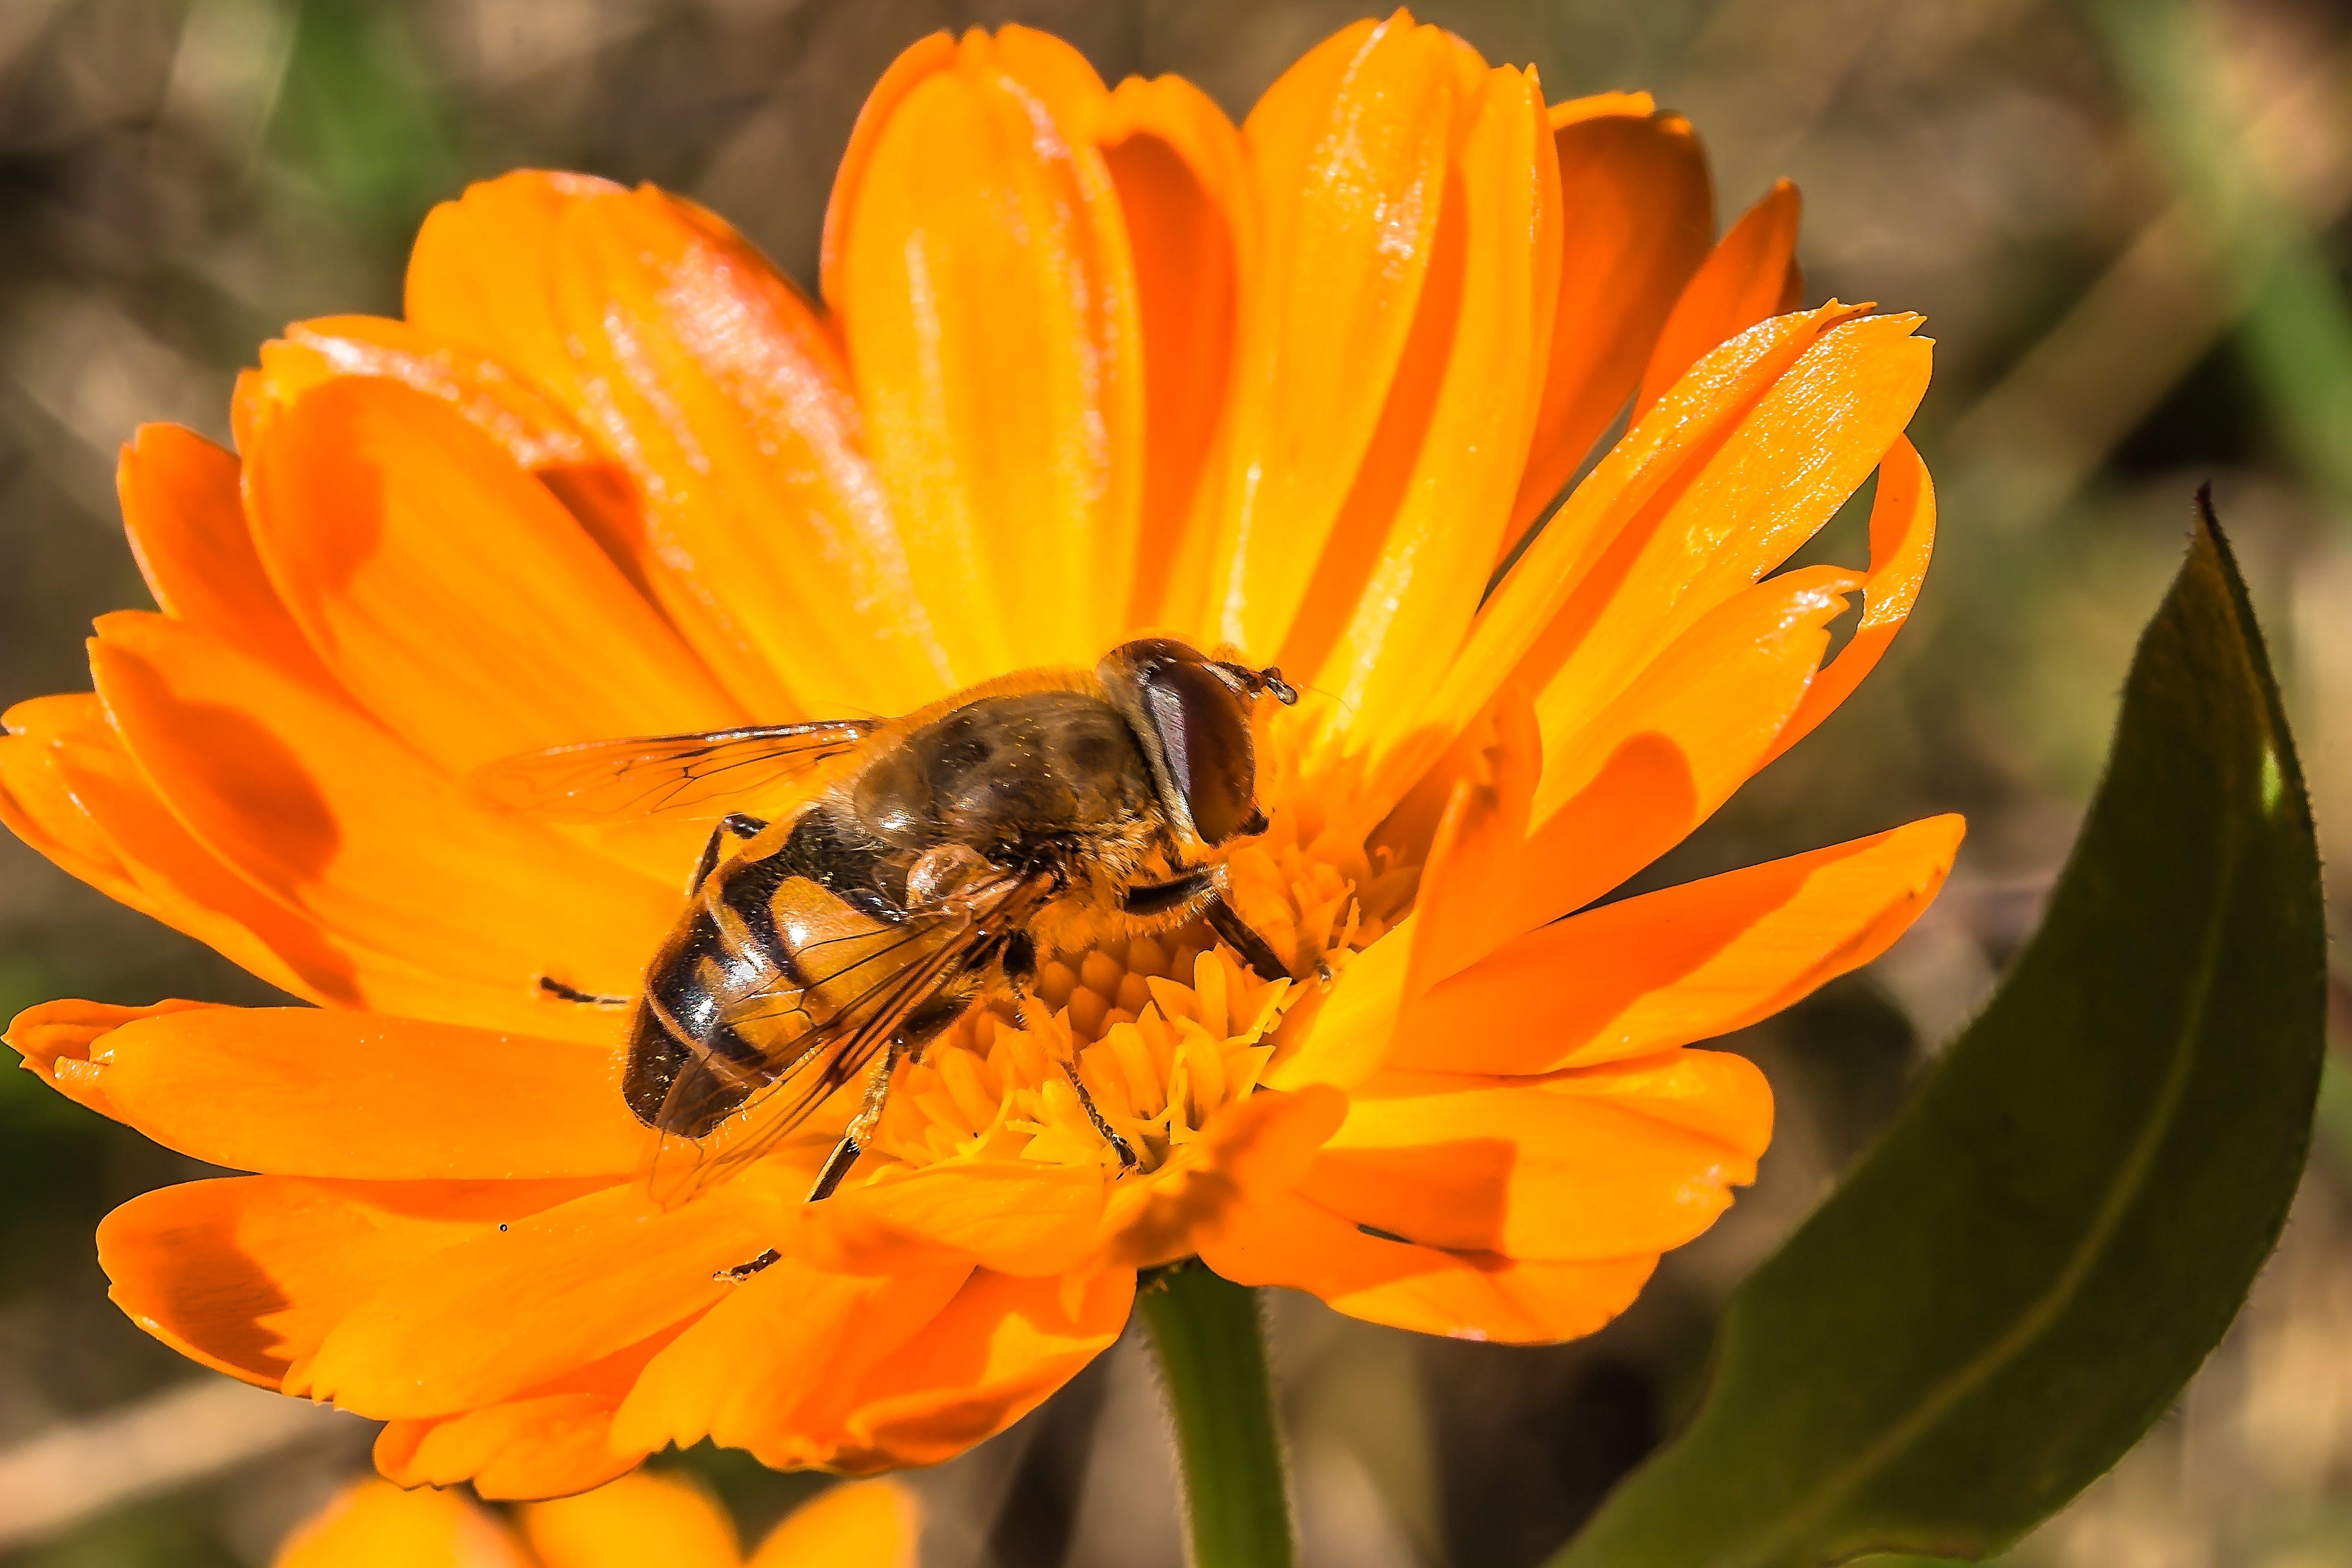 Free stock photo of nature, animal, flower, pollen